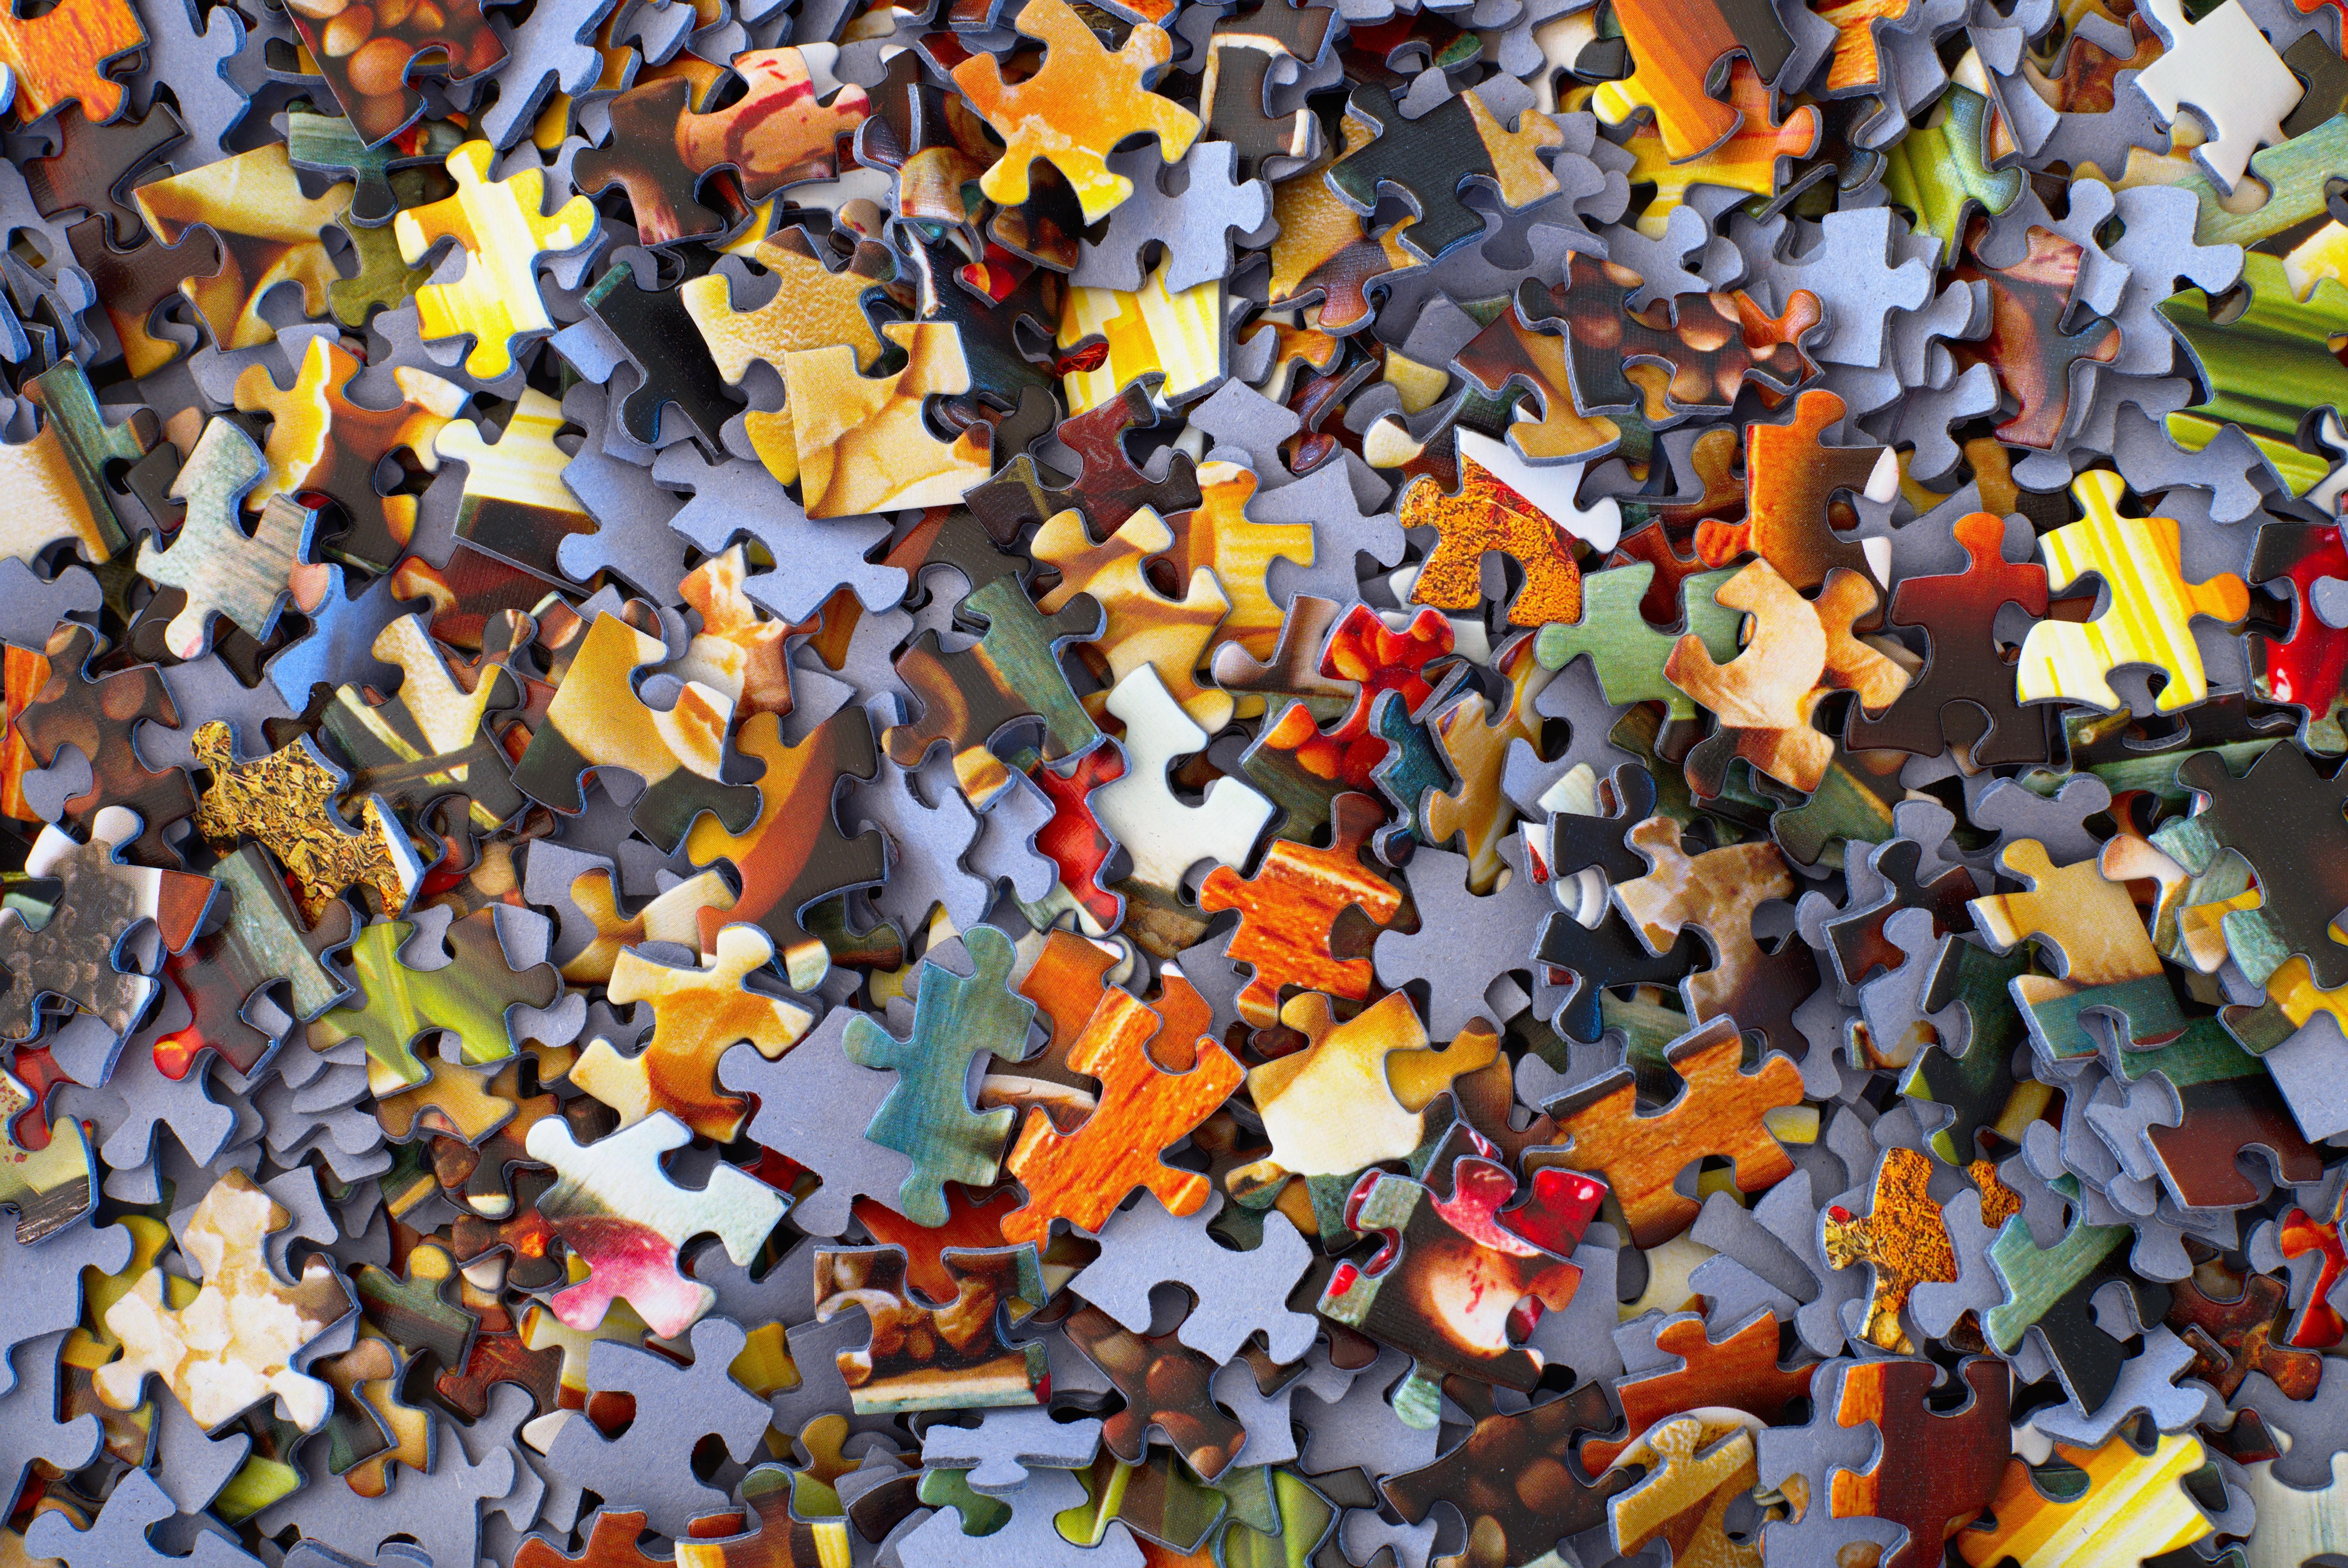 Travel Jigsaw Puzzles for the Coronavirus Lockdown The New 7 Wonders of the World!